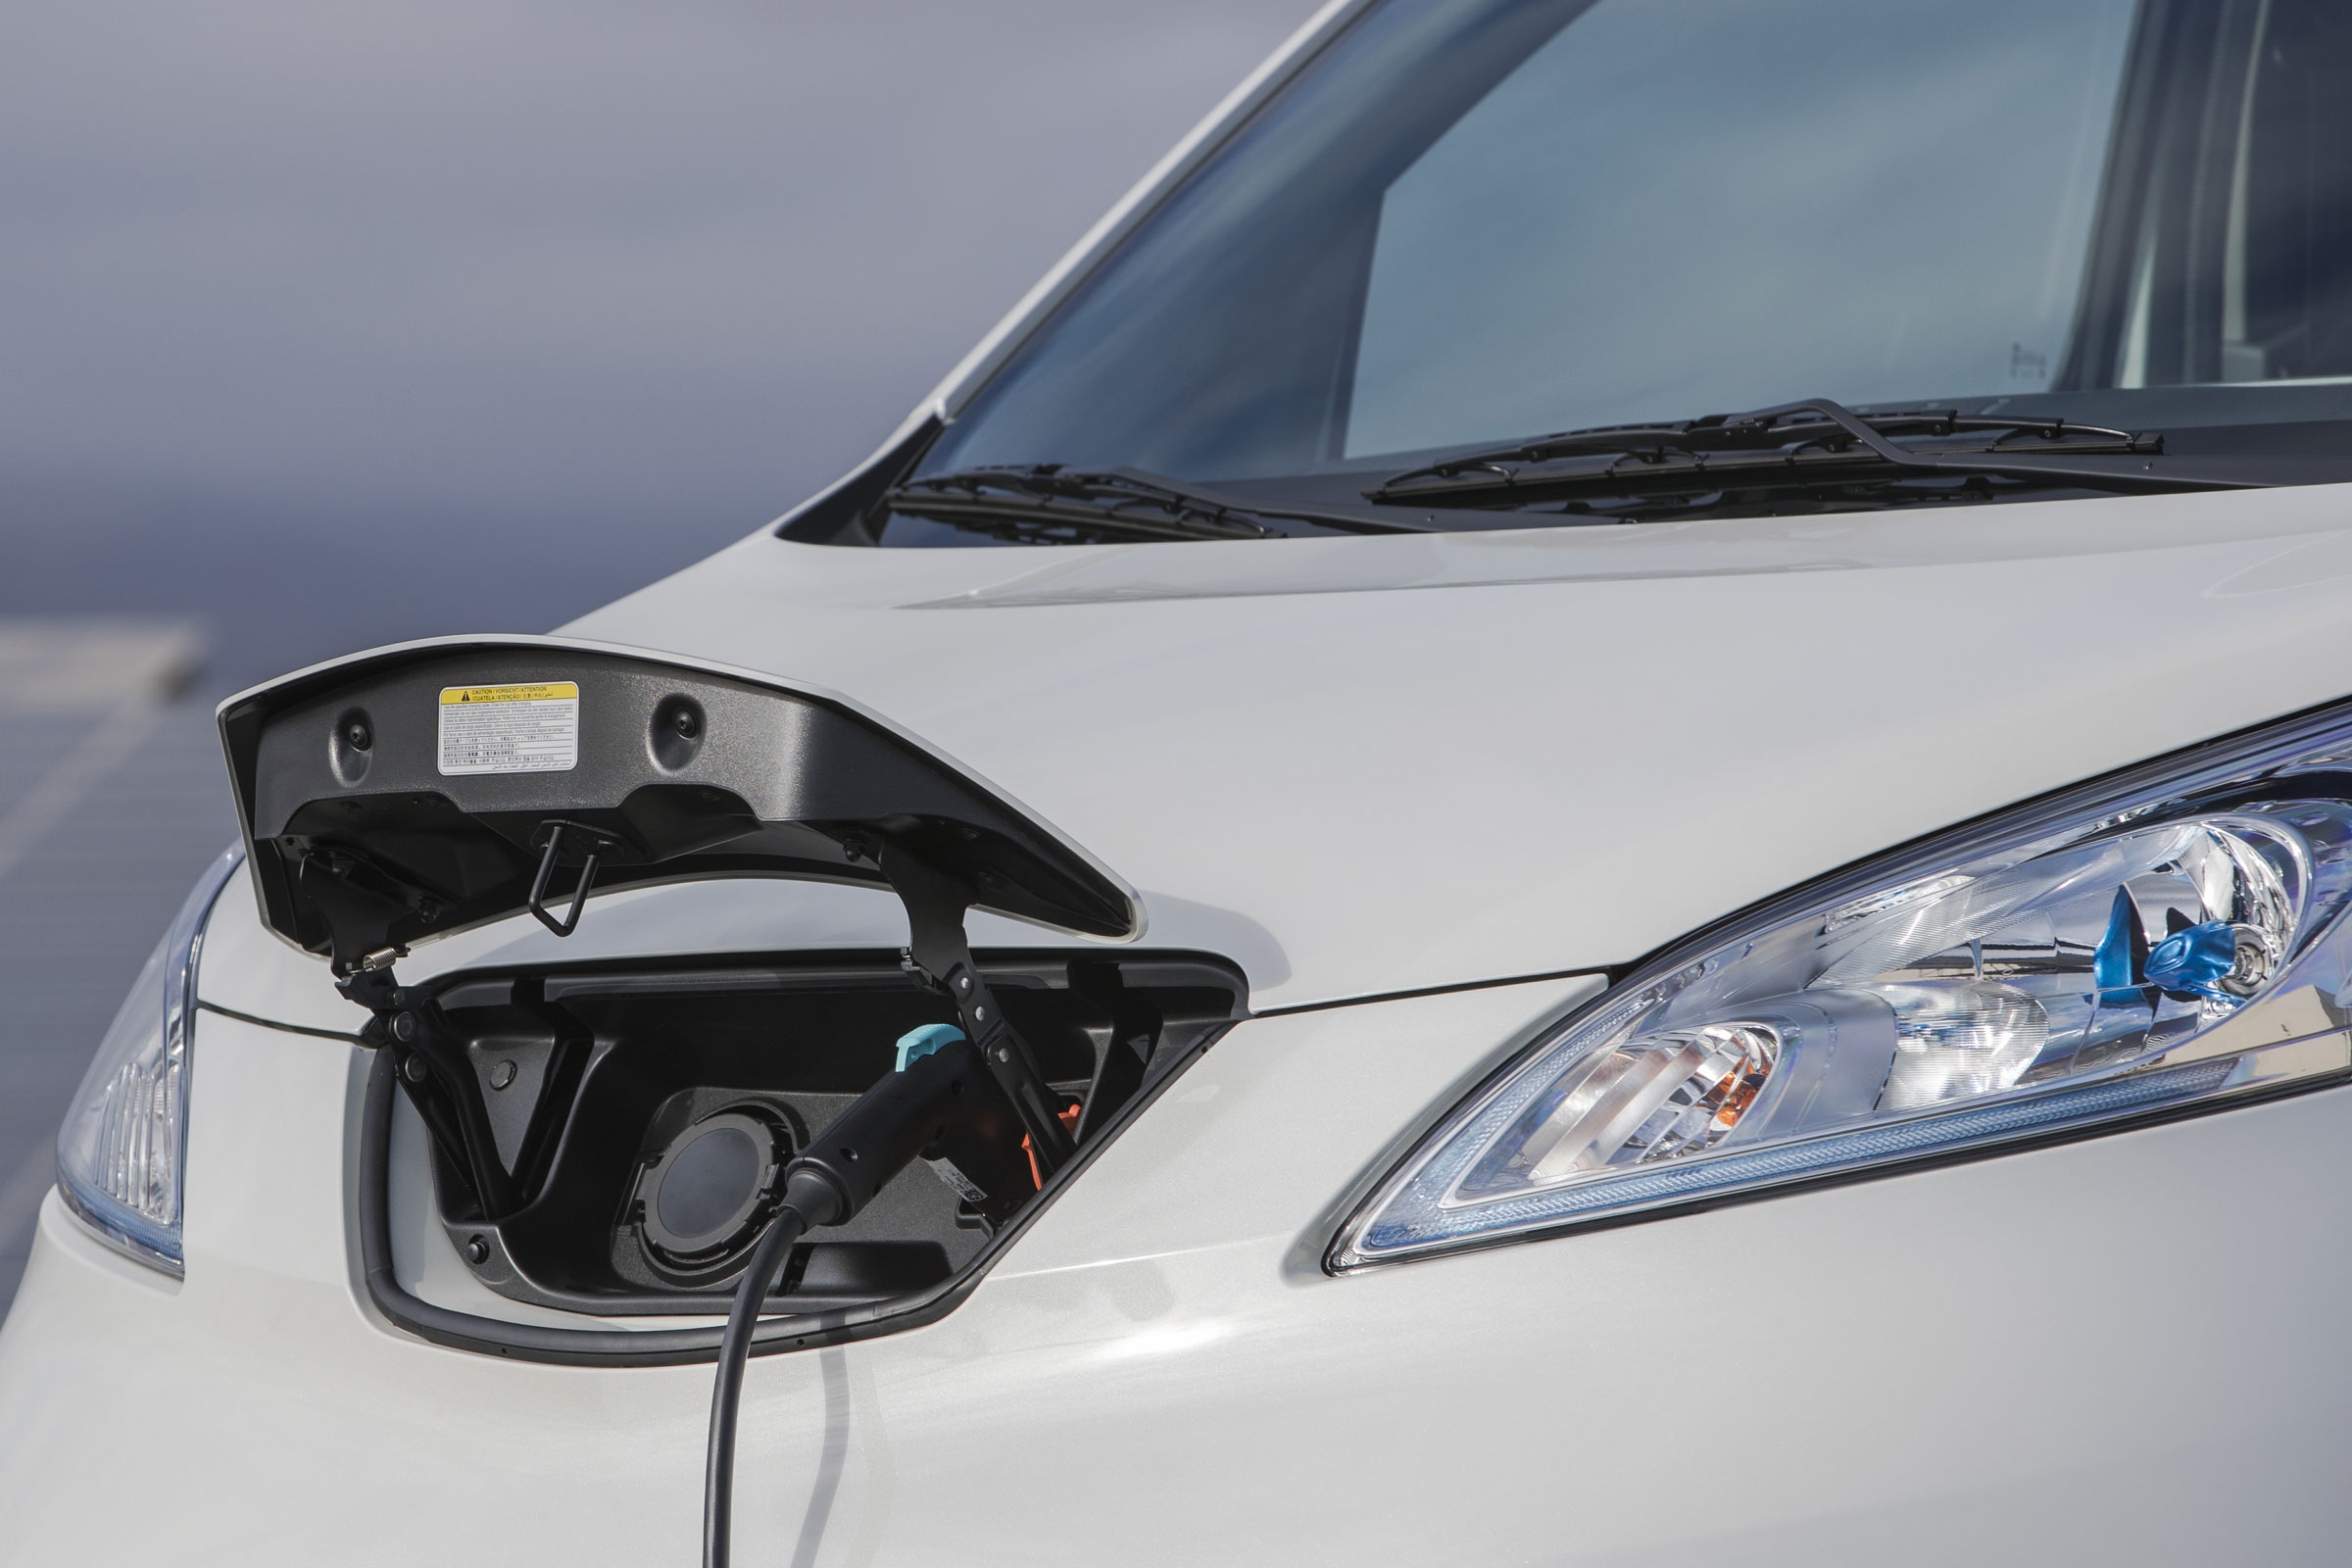 www.drivingelectric.com